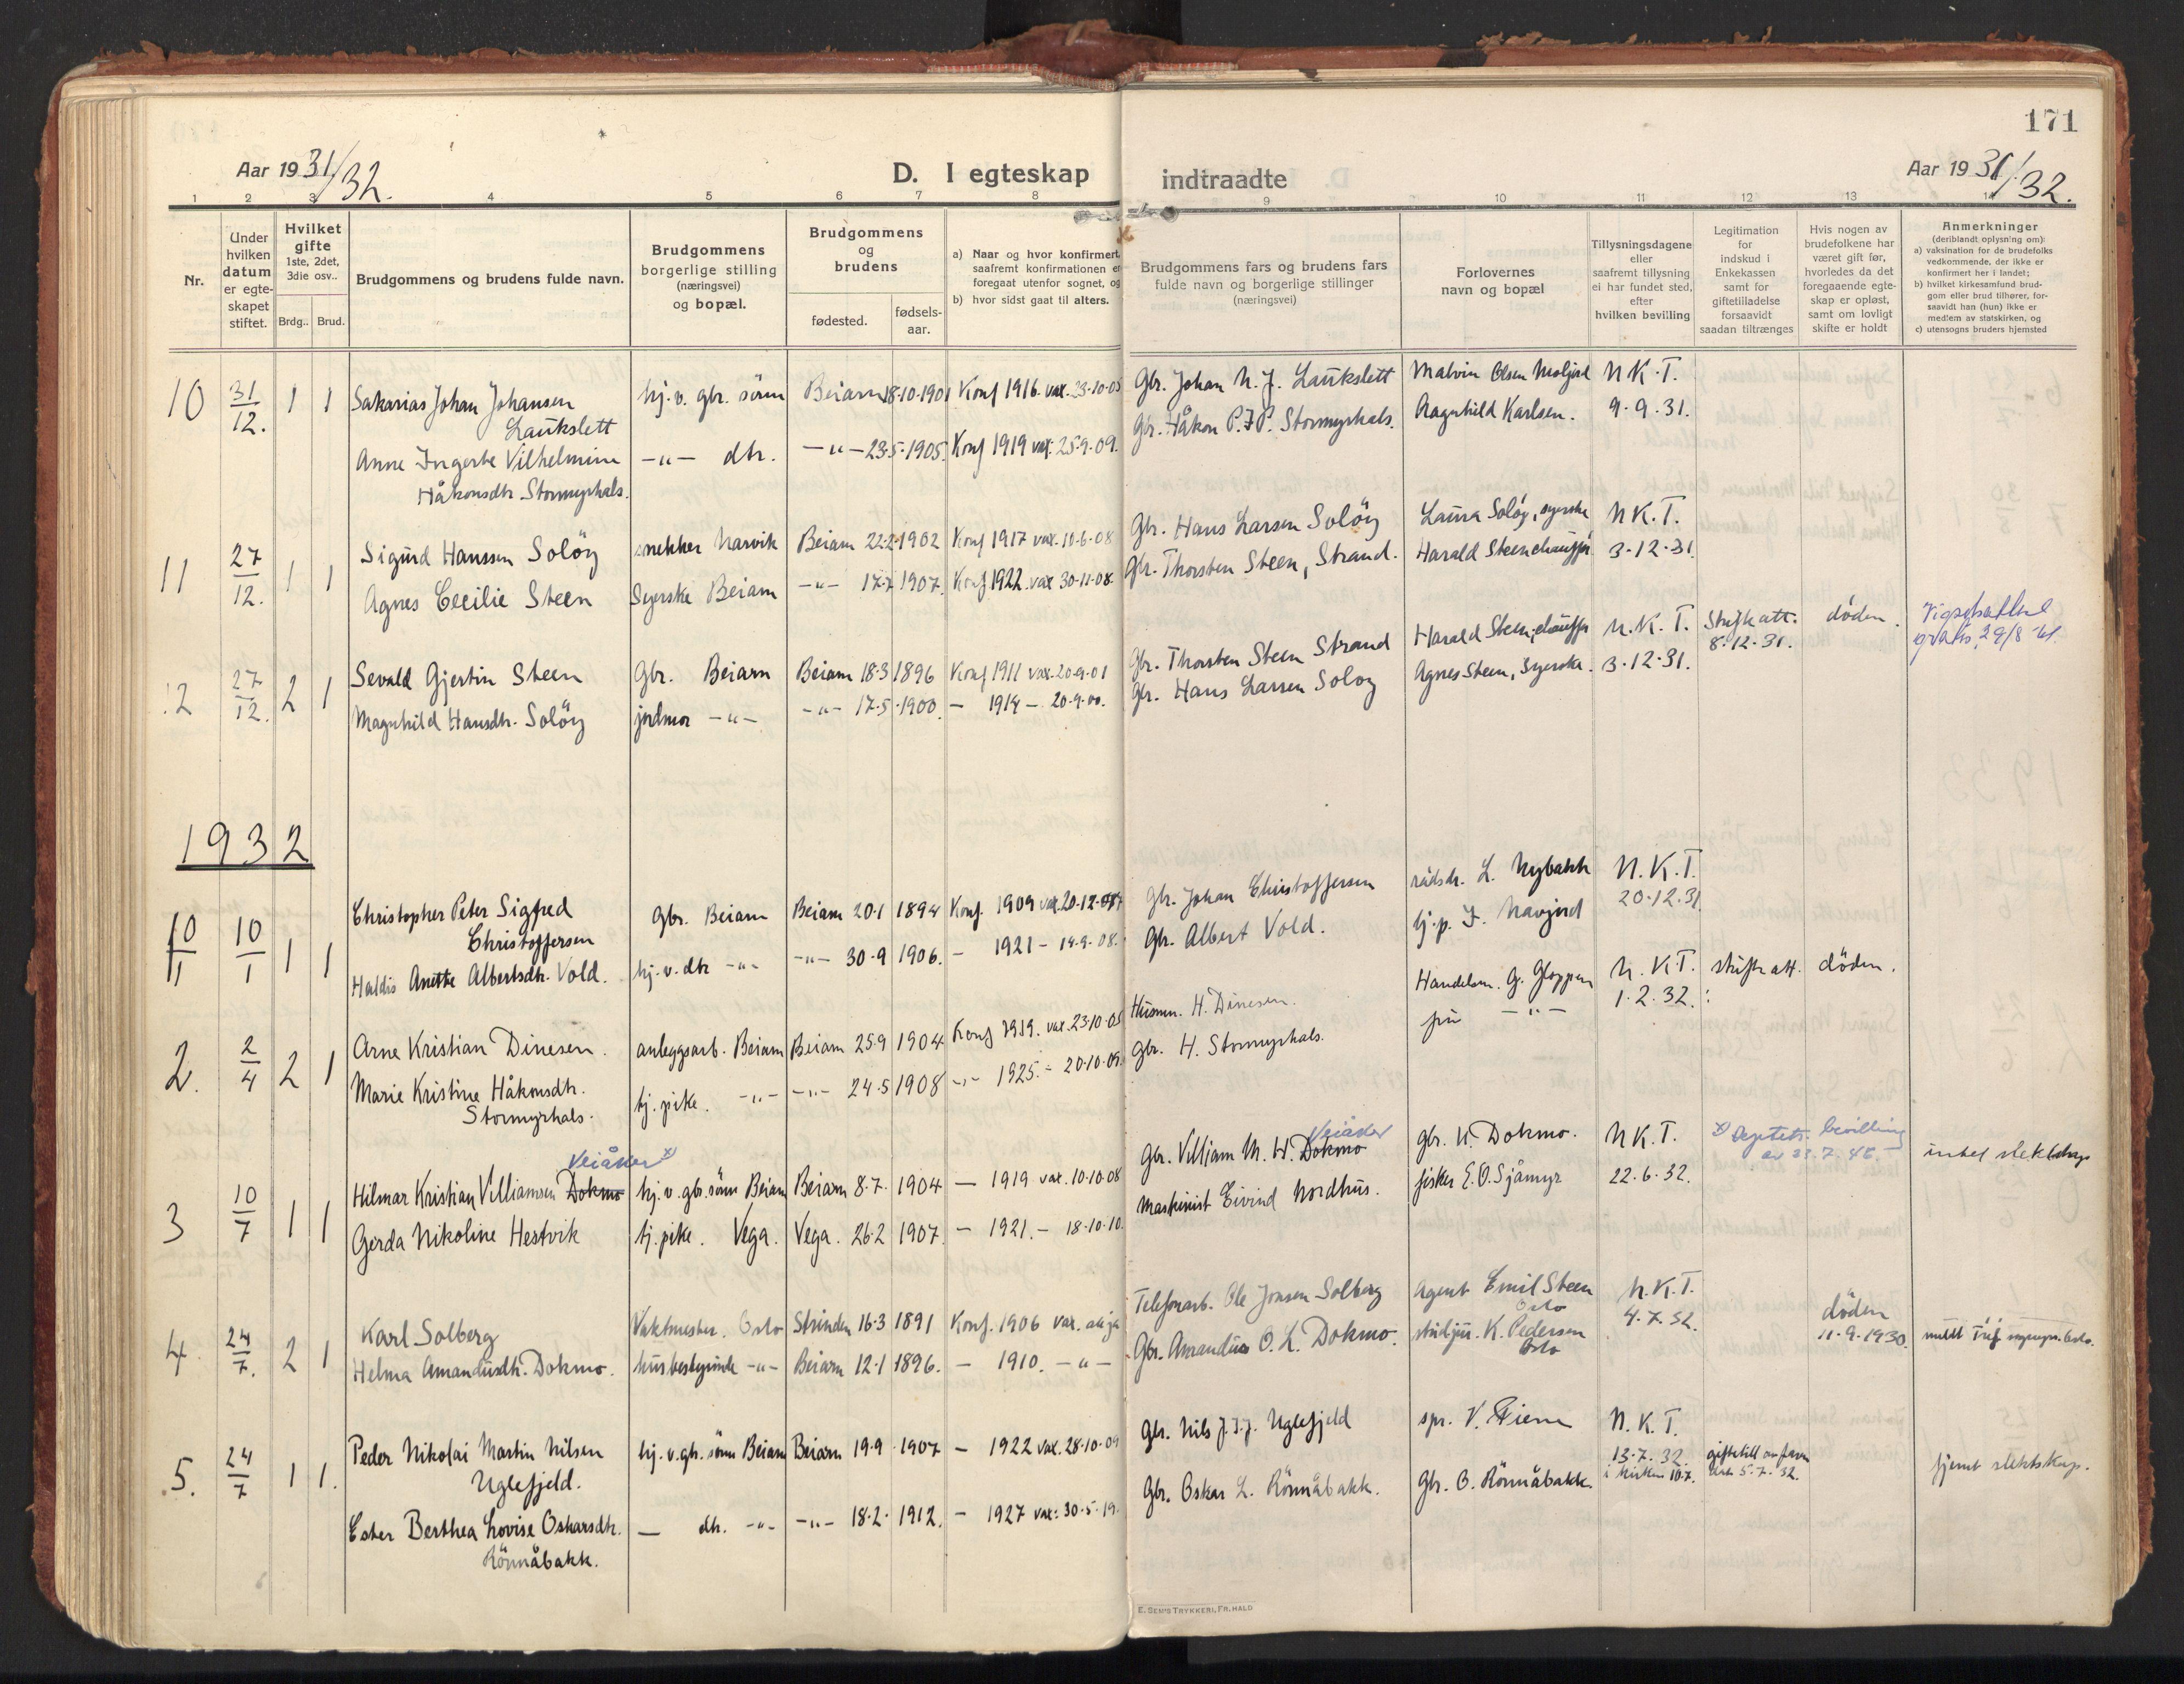 SAT, Ministerialprotokoller, klokkerbøker og fødselsregistre - Nordland, 846/L0650: Ministerialbok nr. 846A08, 1916-1935, s. 171